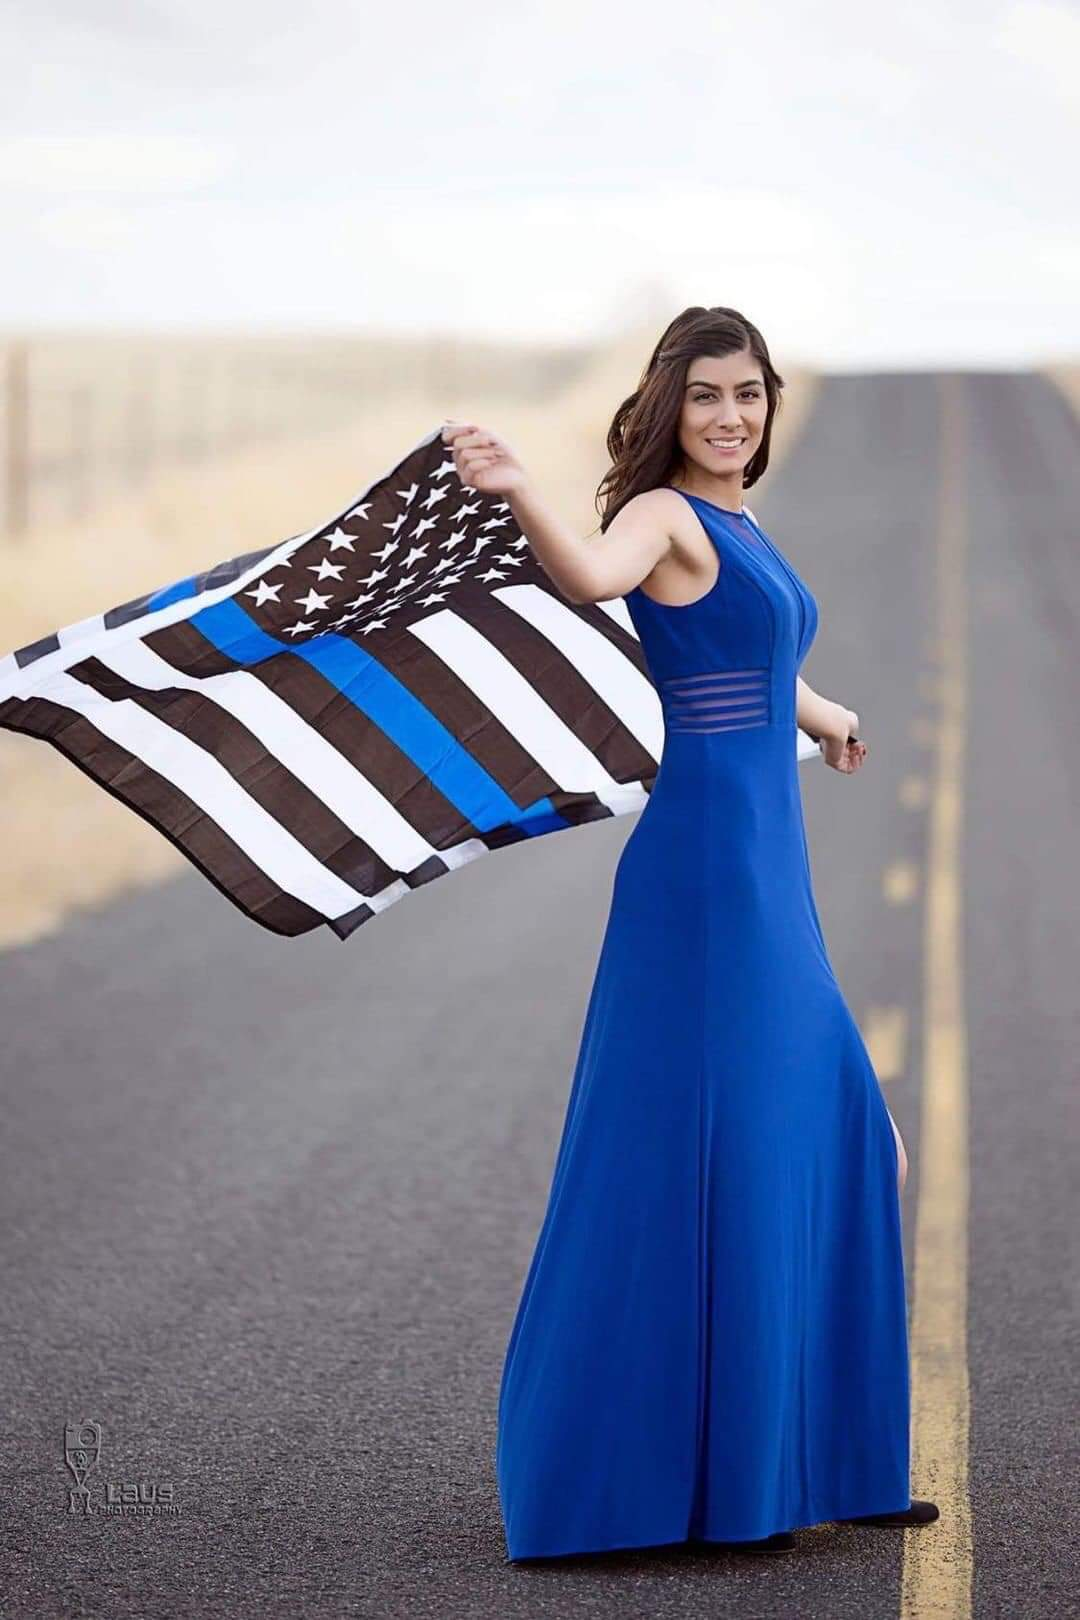 Officer Natalie Corona